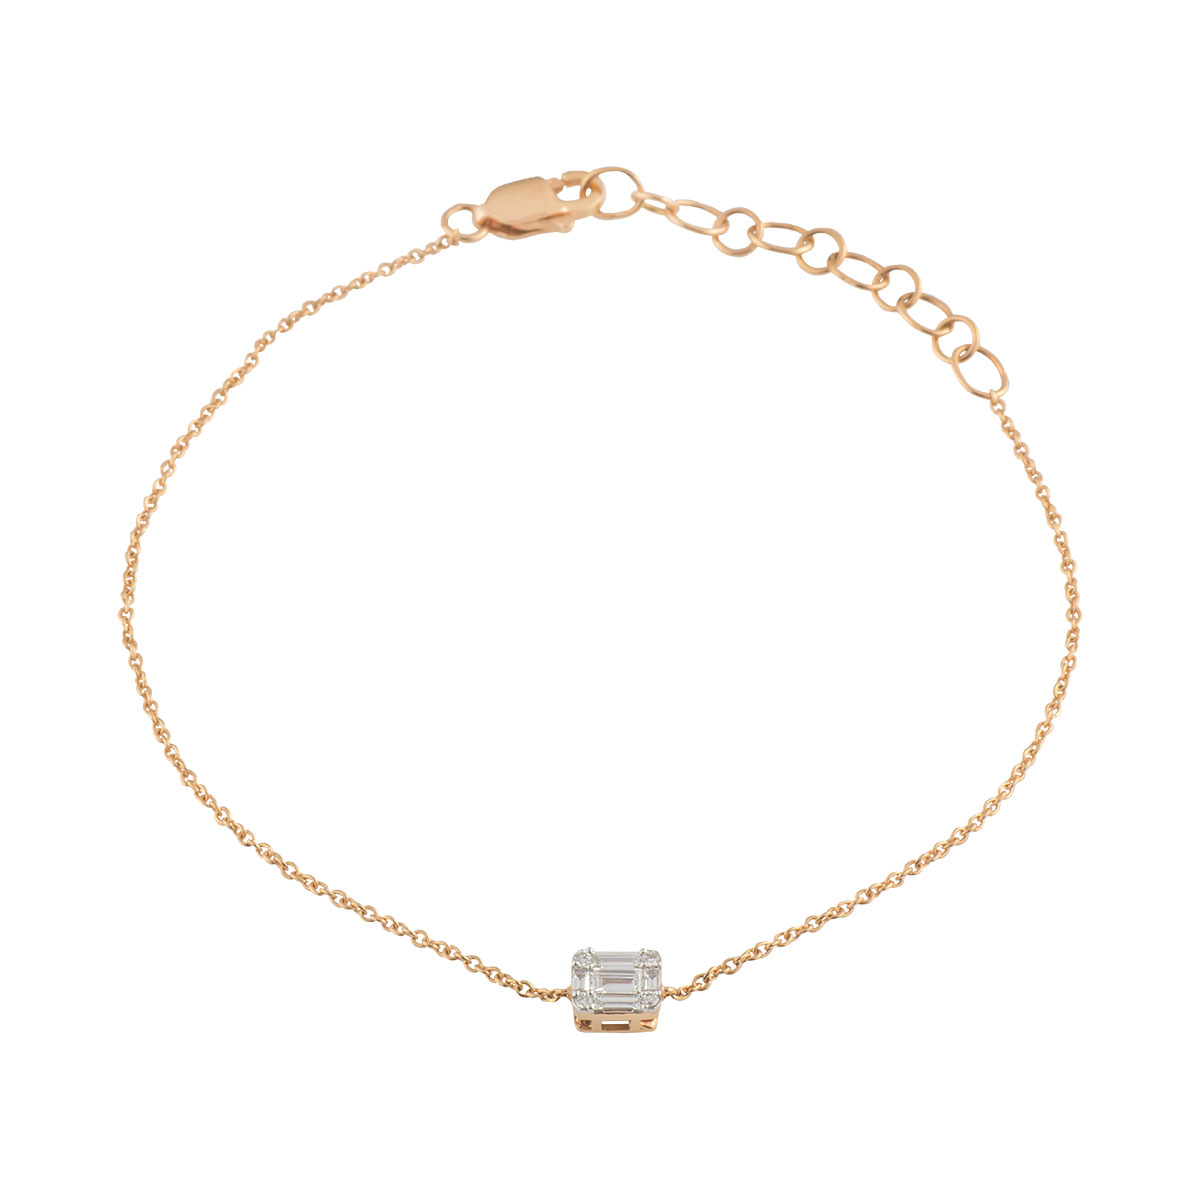 Rose Gold Cluster Diamond Bracelet 0.14ct G-H/VS-VVS